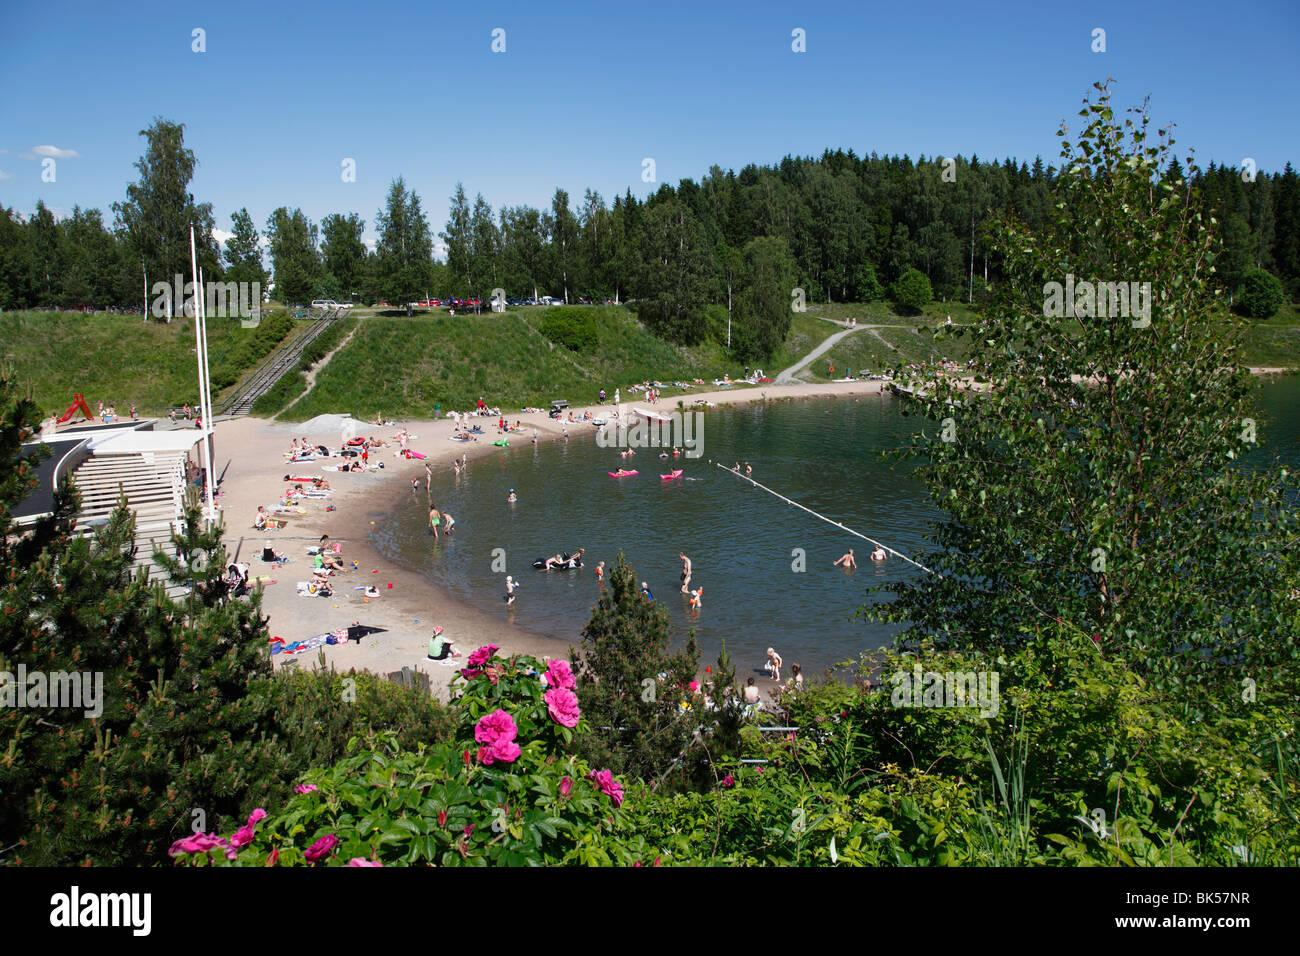 Kokonniemi outdoor swimming pool, Porvoo, Uusimaa, Finland, Scandinavia, Europe - Stock Image